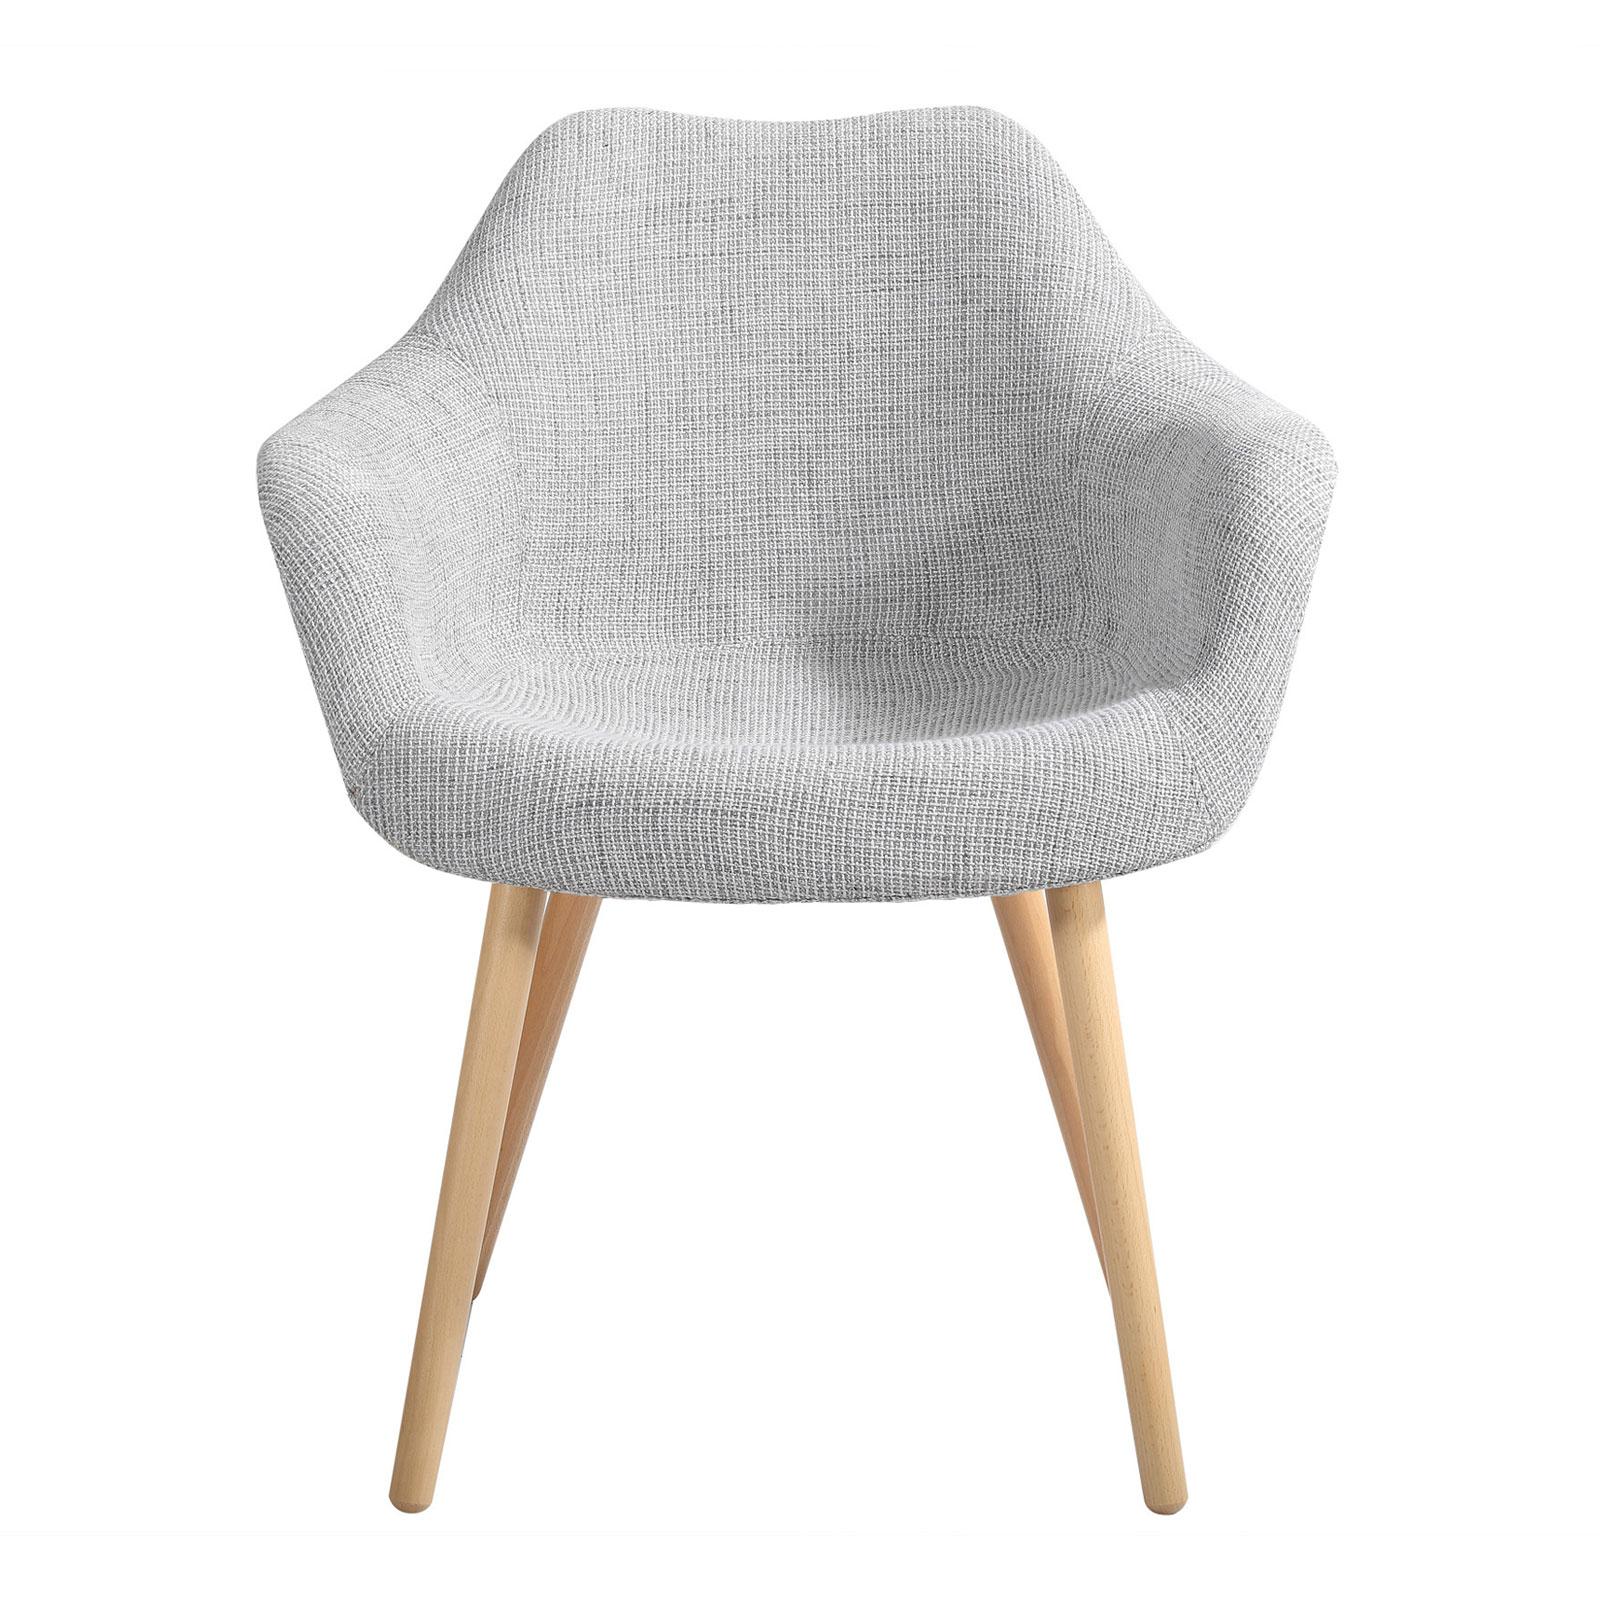 Chaise en tissu gris